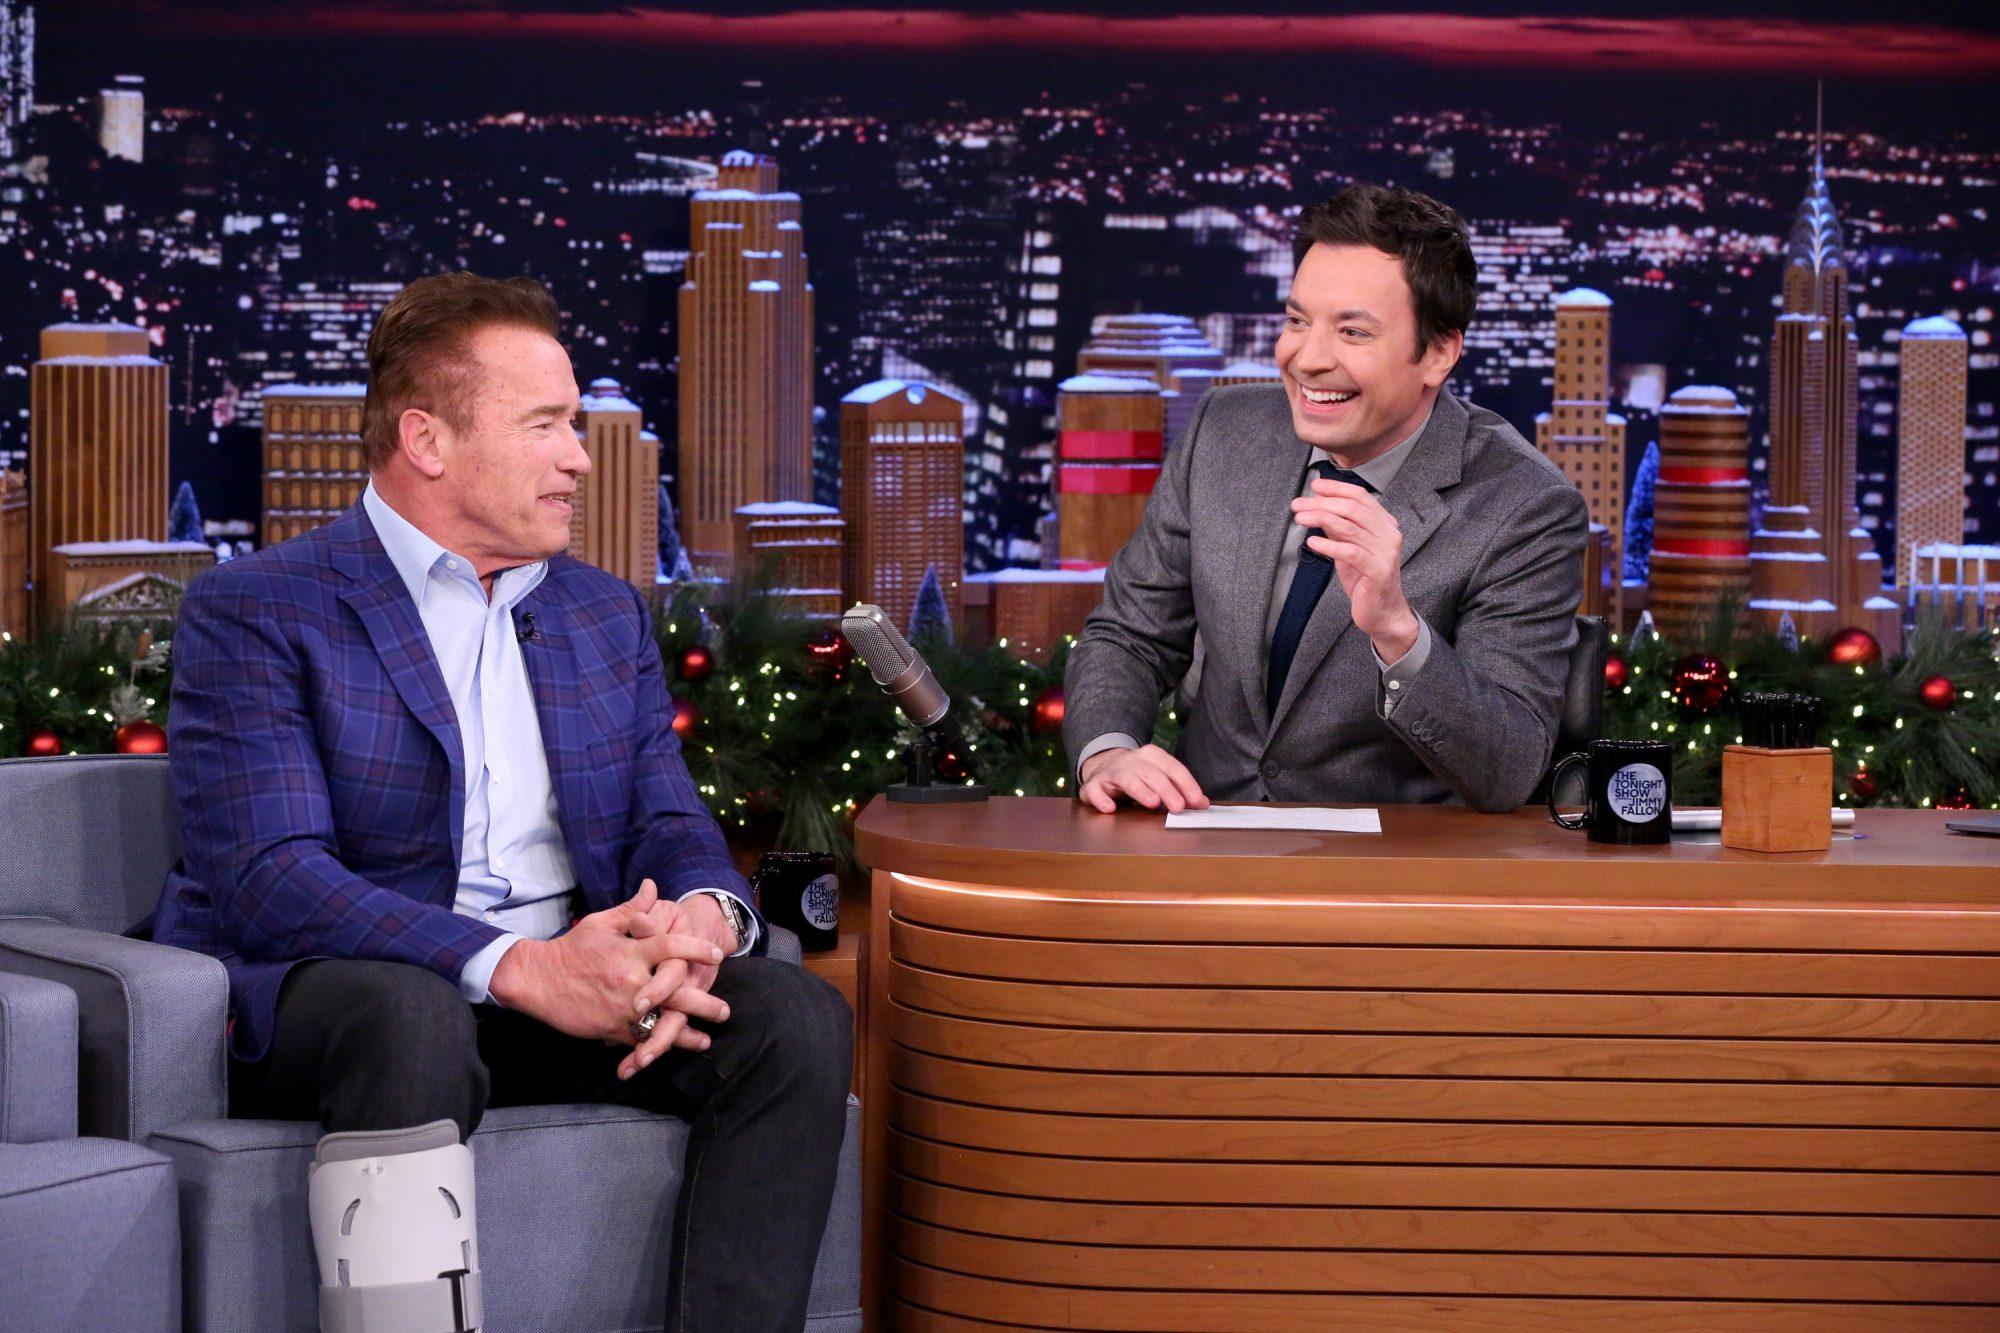 Schwarzenegger on Fallon